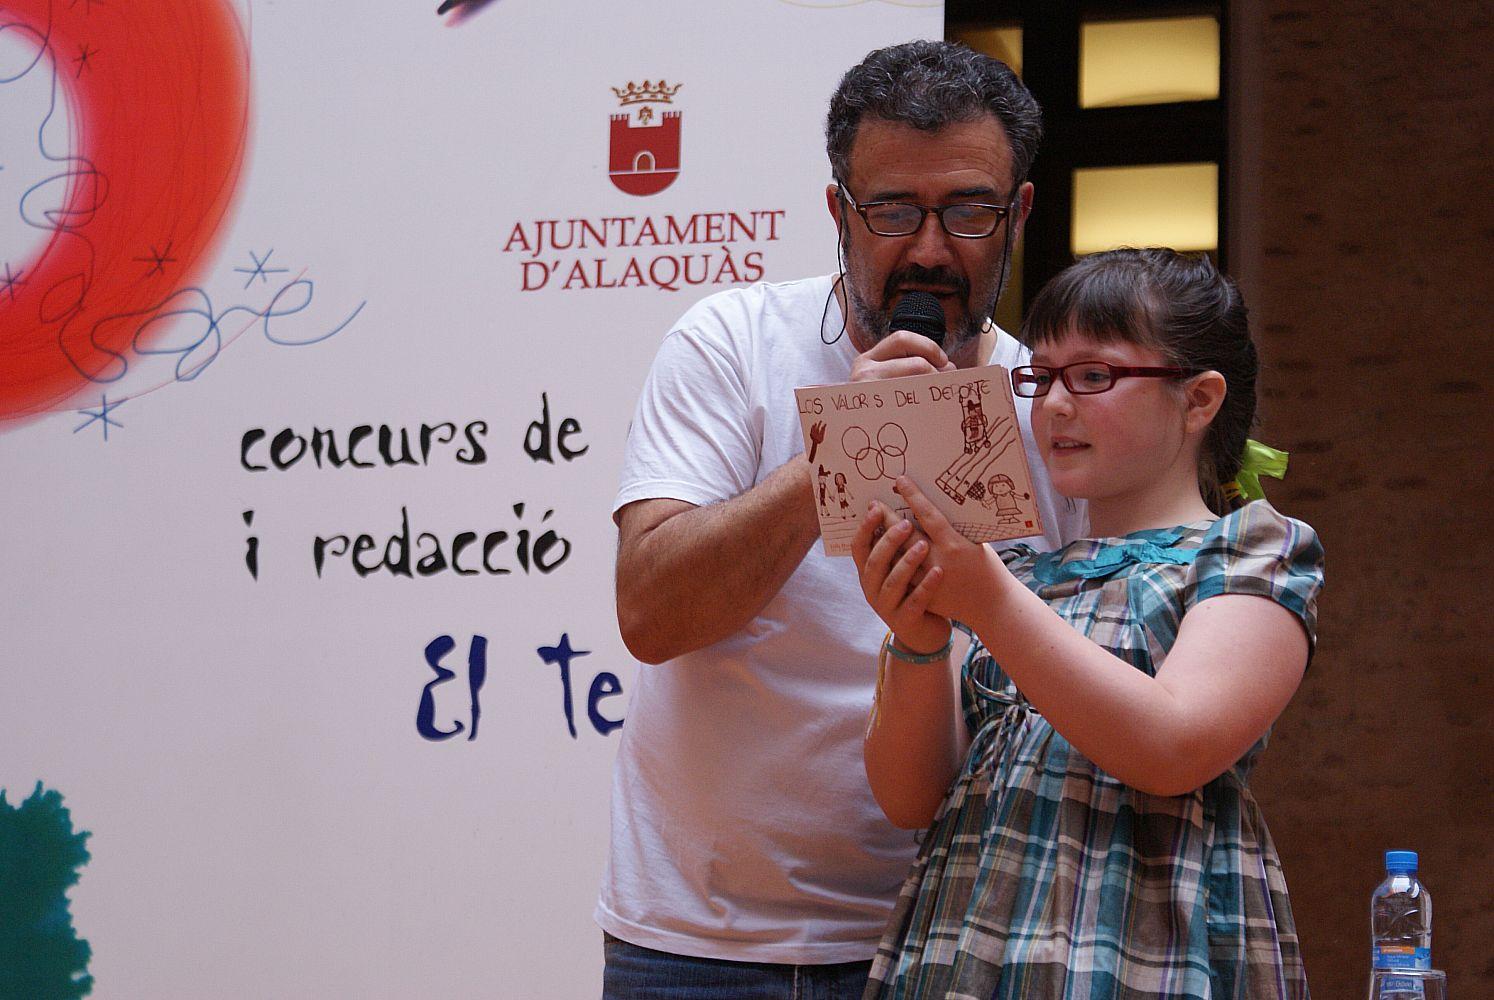 Ajuntament d 39 alaqu s prensa el teulad reconoce los - Trabajo en alaquas ...